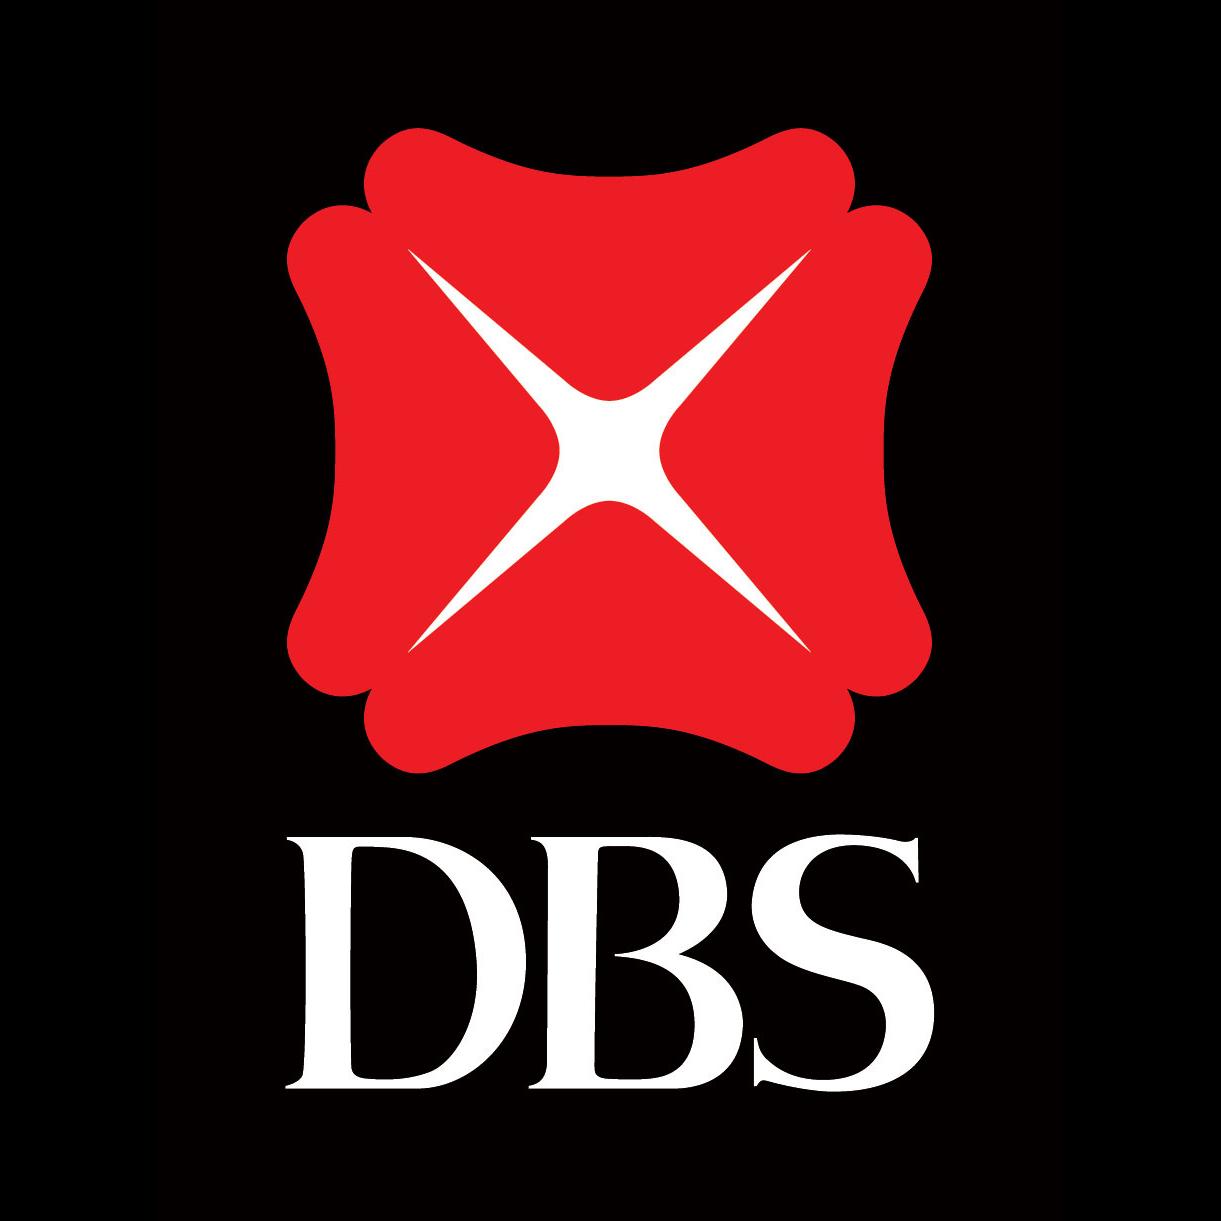 Logo Dbs PNG - 34285